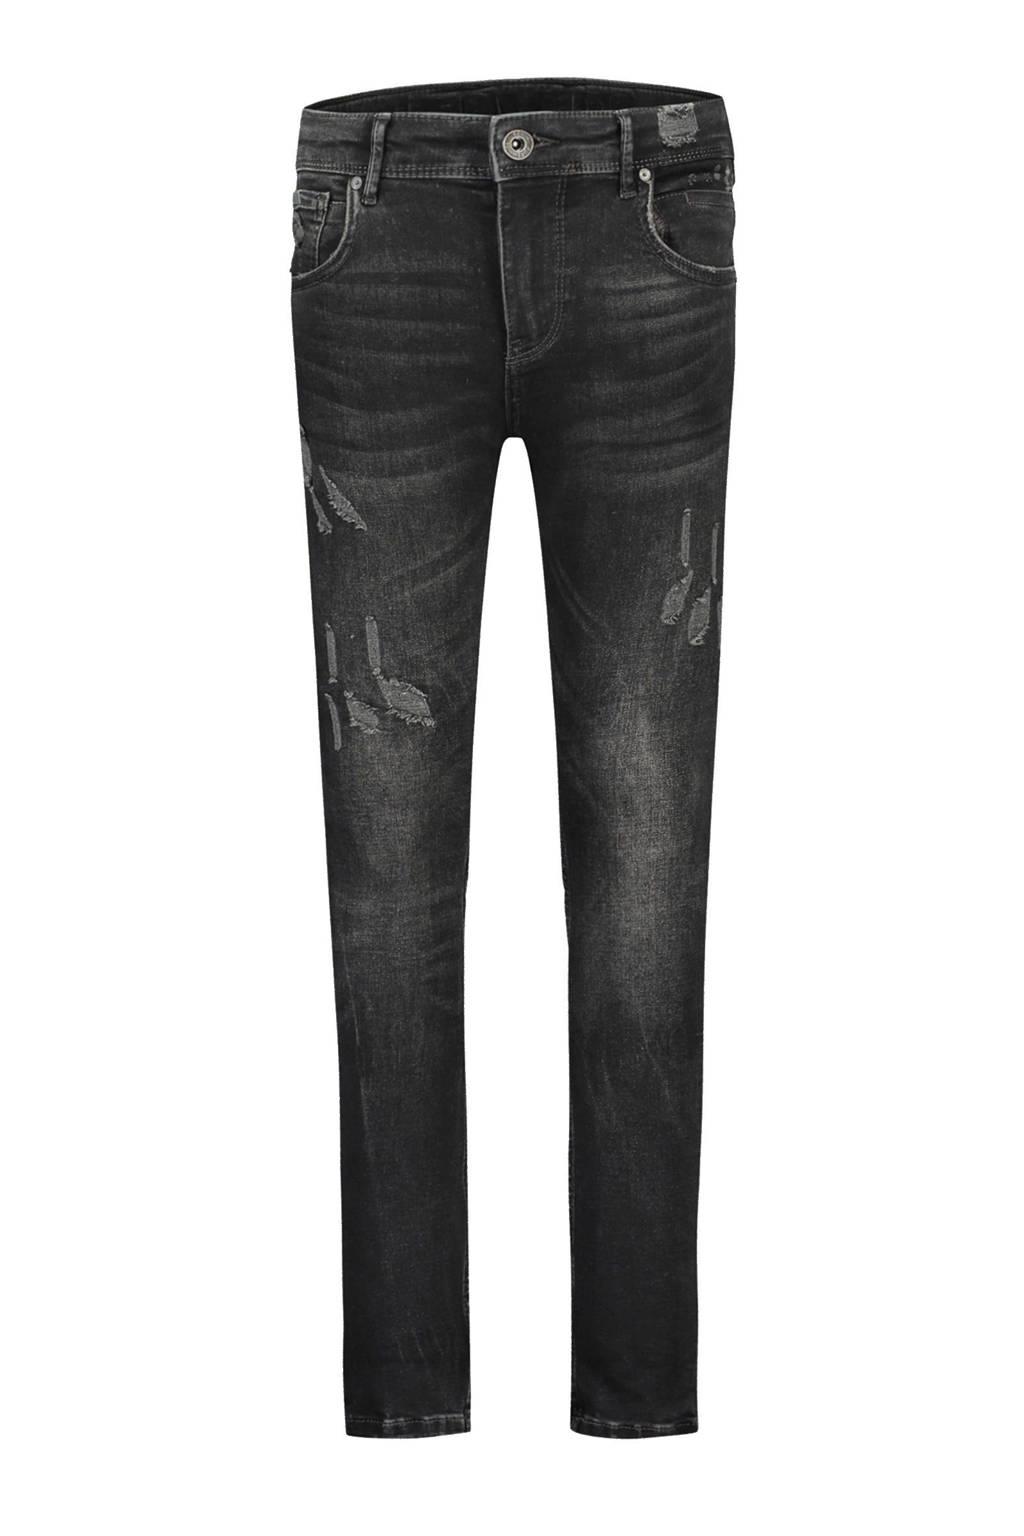 Ballin skinny jeans Jeans Pure White zwart, Zwart